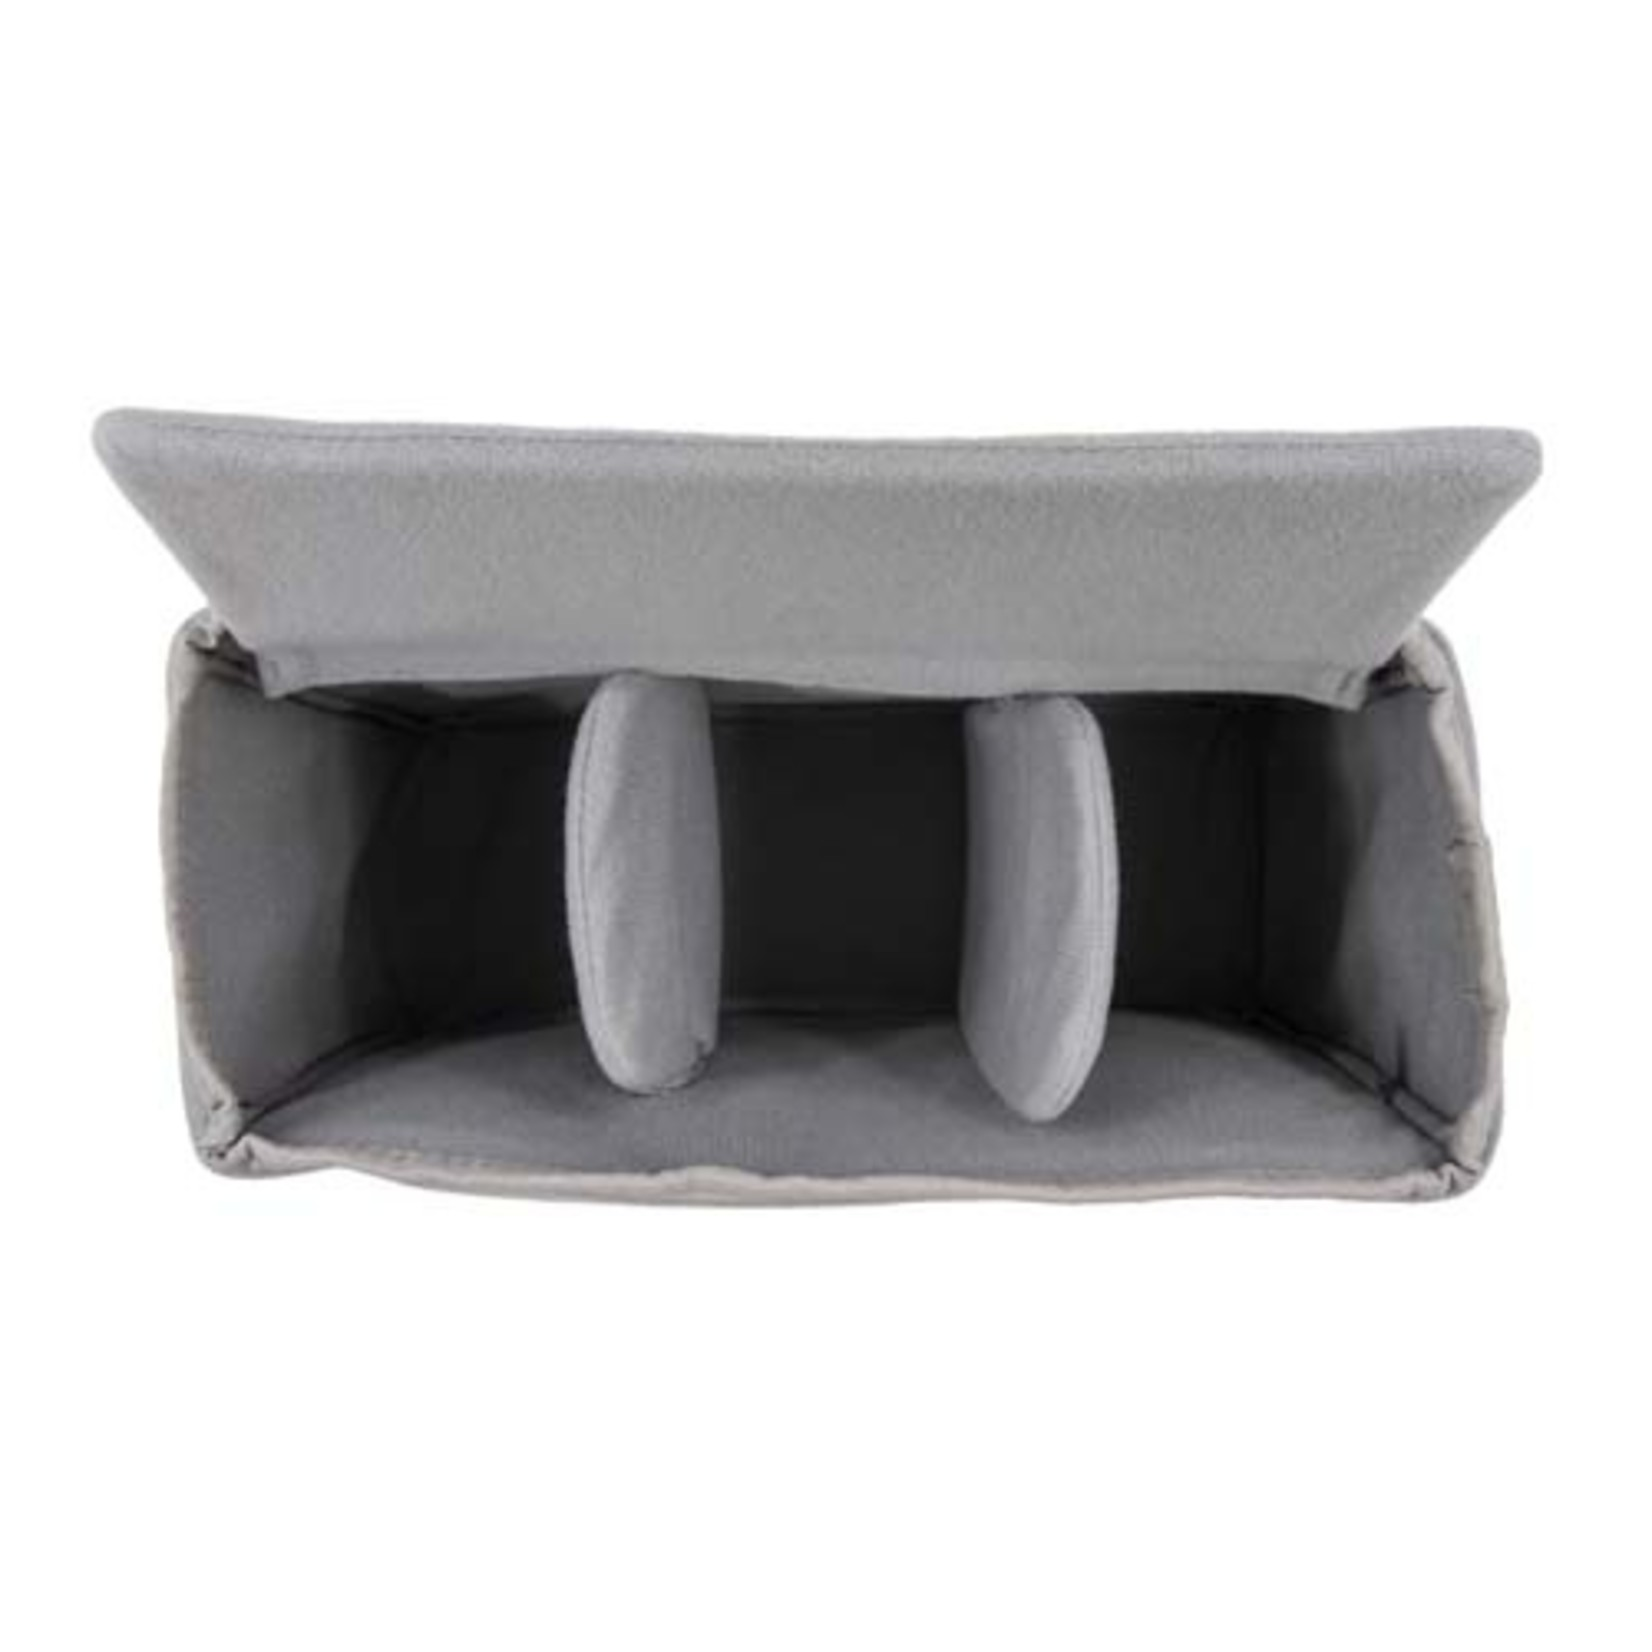 ProMaster Bag Insert - Extra Large